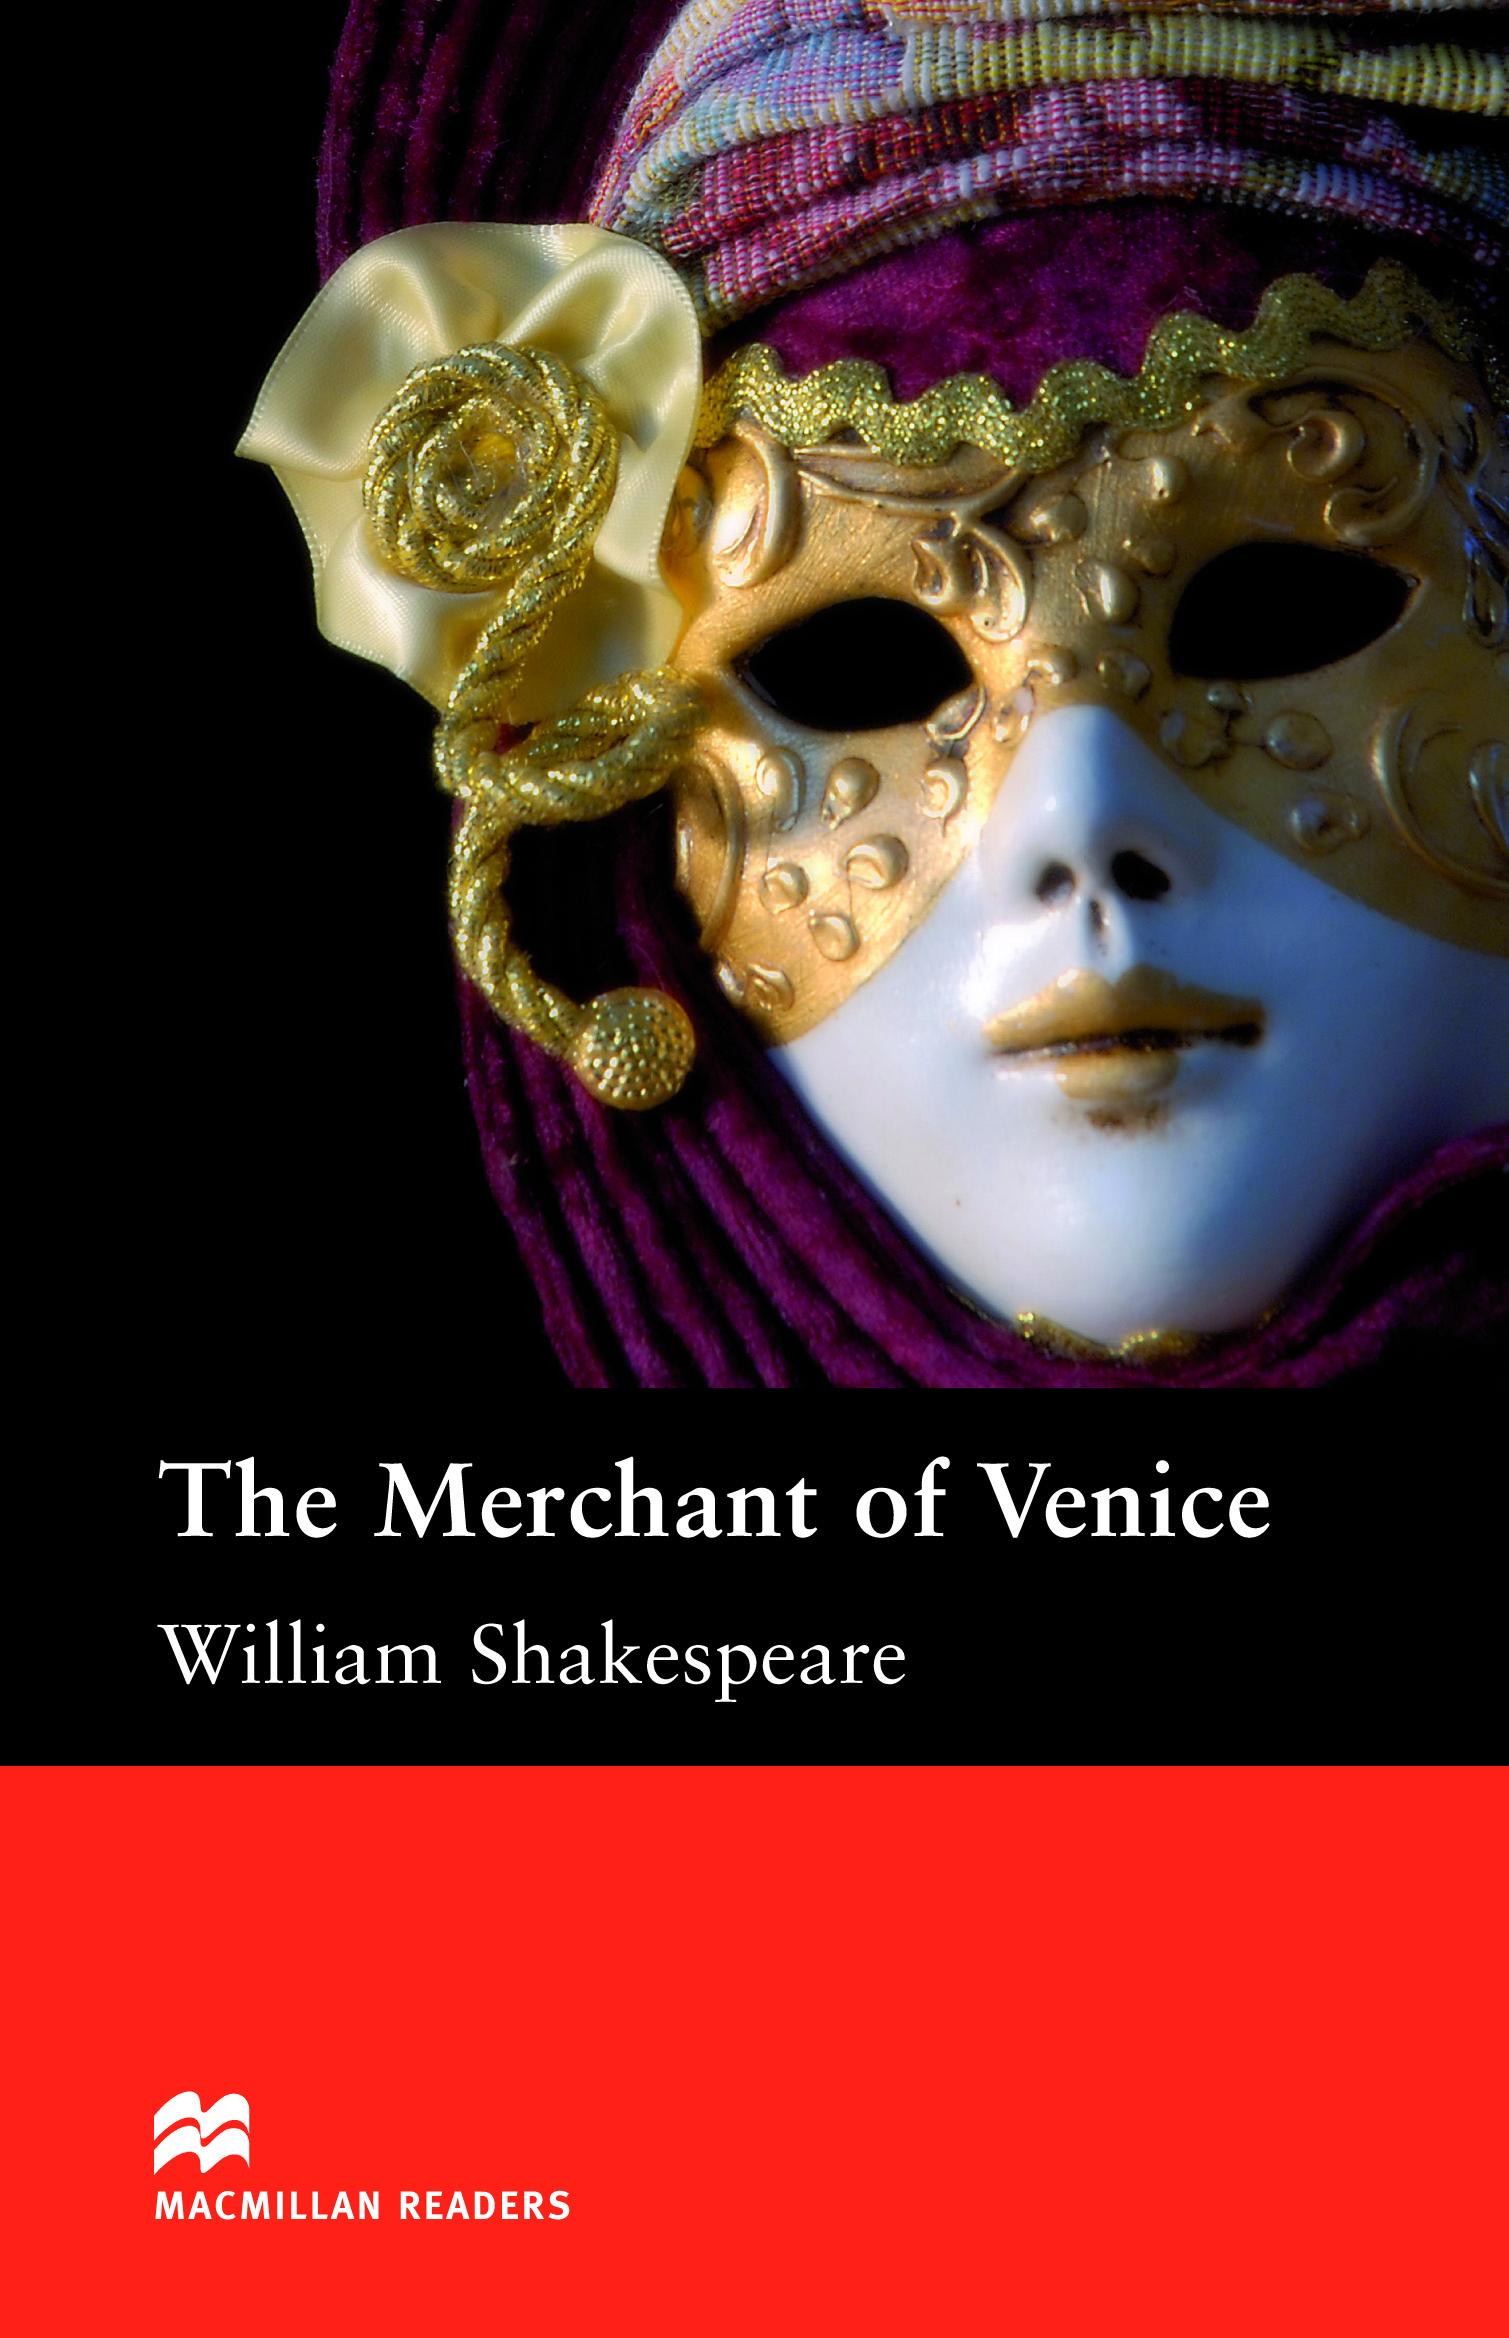 Macmillan Readers: The Merchant of Venice